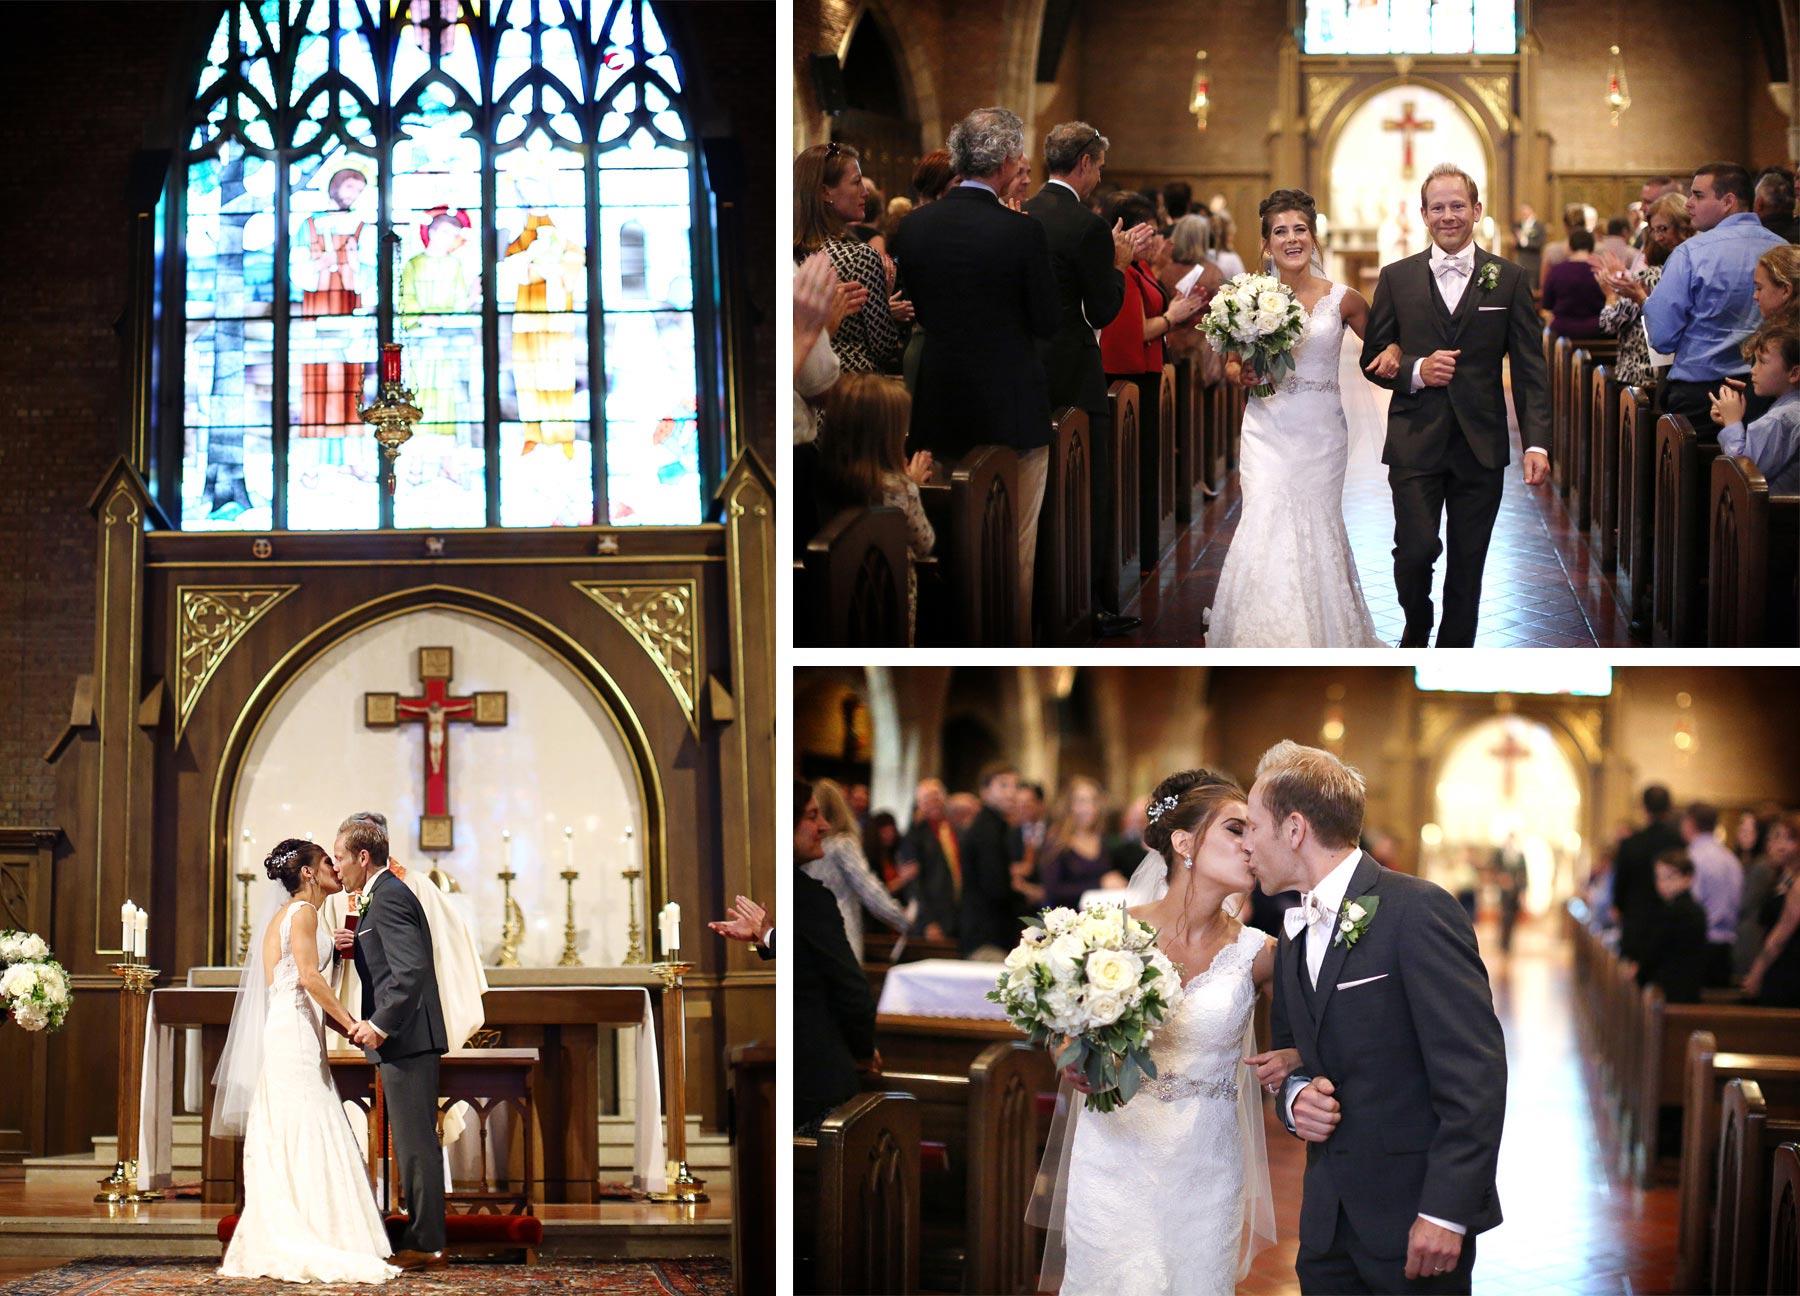 08-Saint-Louis-Park-Minnesota-Wedding-Photographer-by-Andrew-Vick-Photography-Fall-Autumn-Holy-Family-Catholic-Church-Ceremony-Bride-Groom-Kiss-Recessional-Paula-and-Jason.jpg